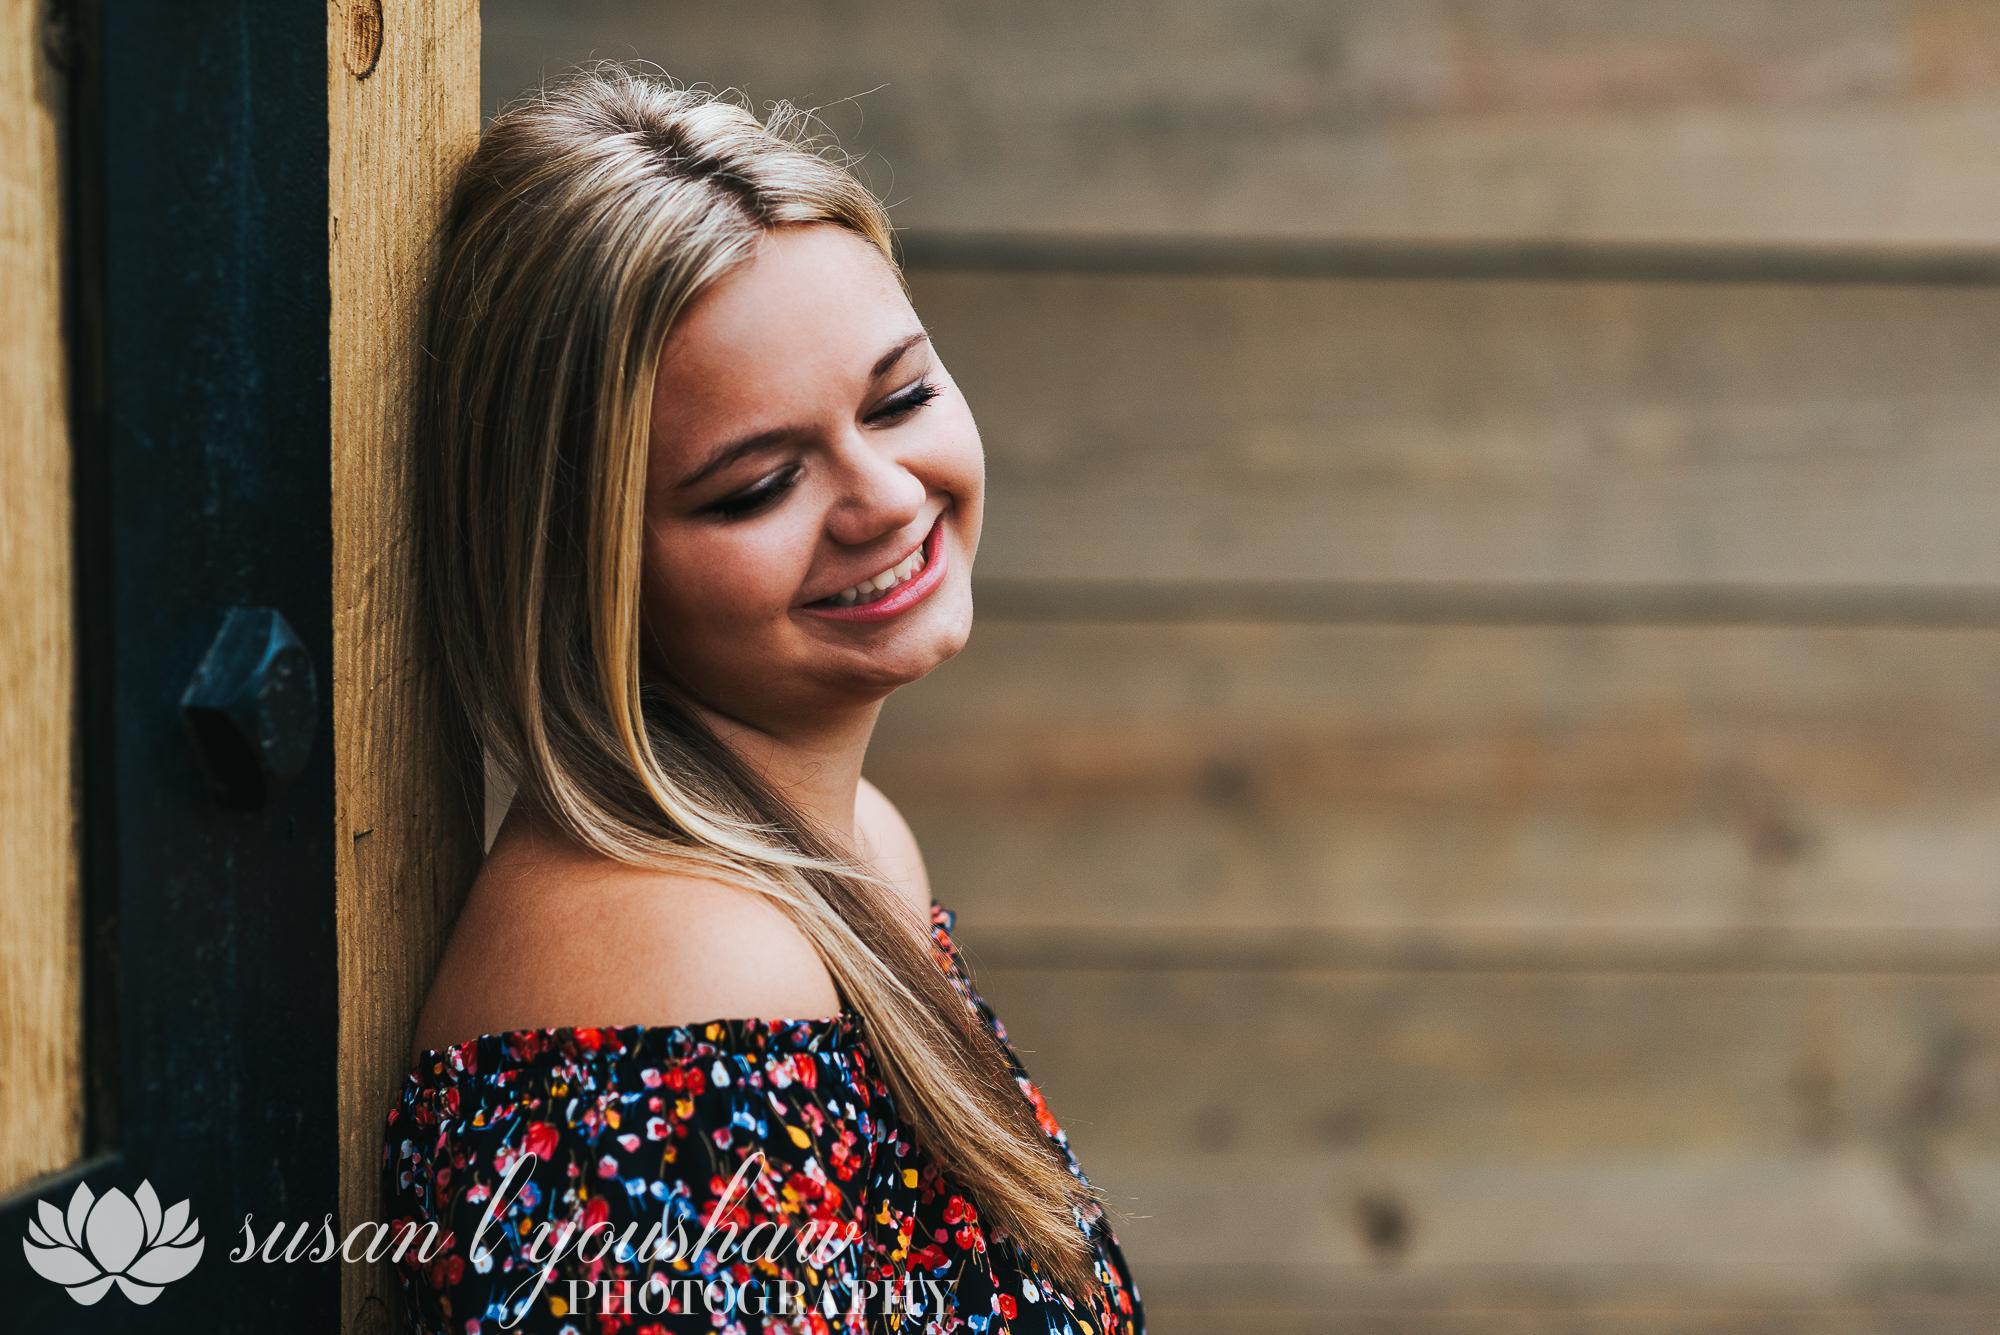 BLOG Karrie Bower 08-16-2018 SLY Photography LLC-6.jpg